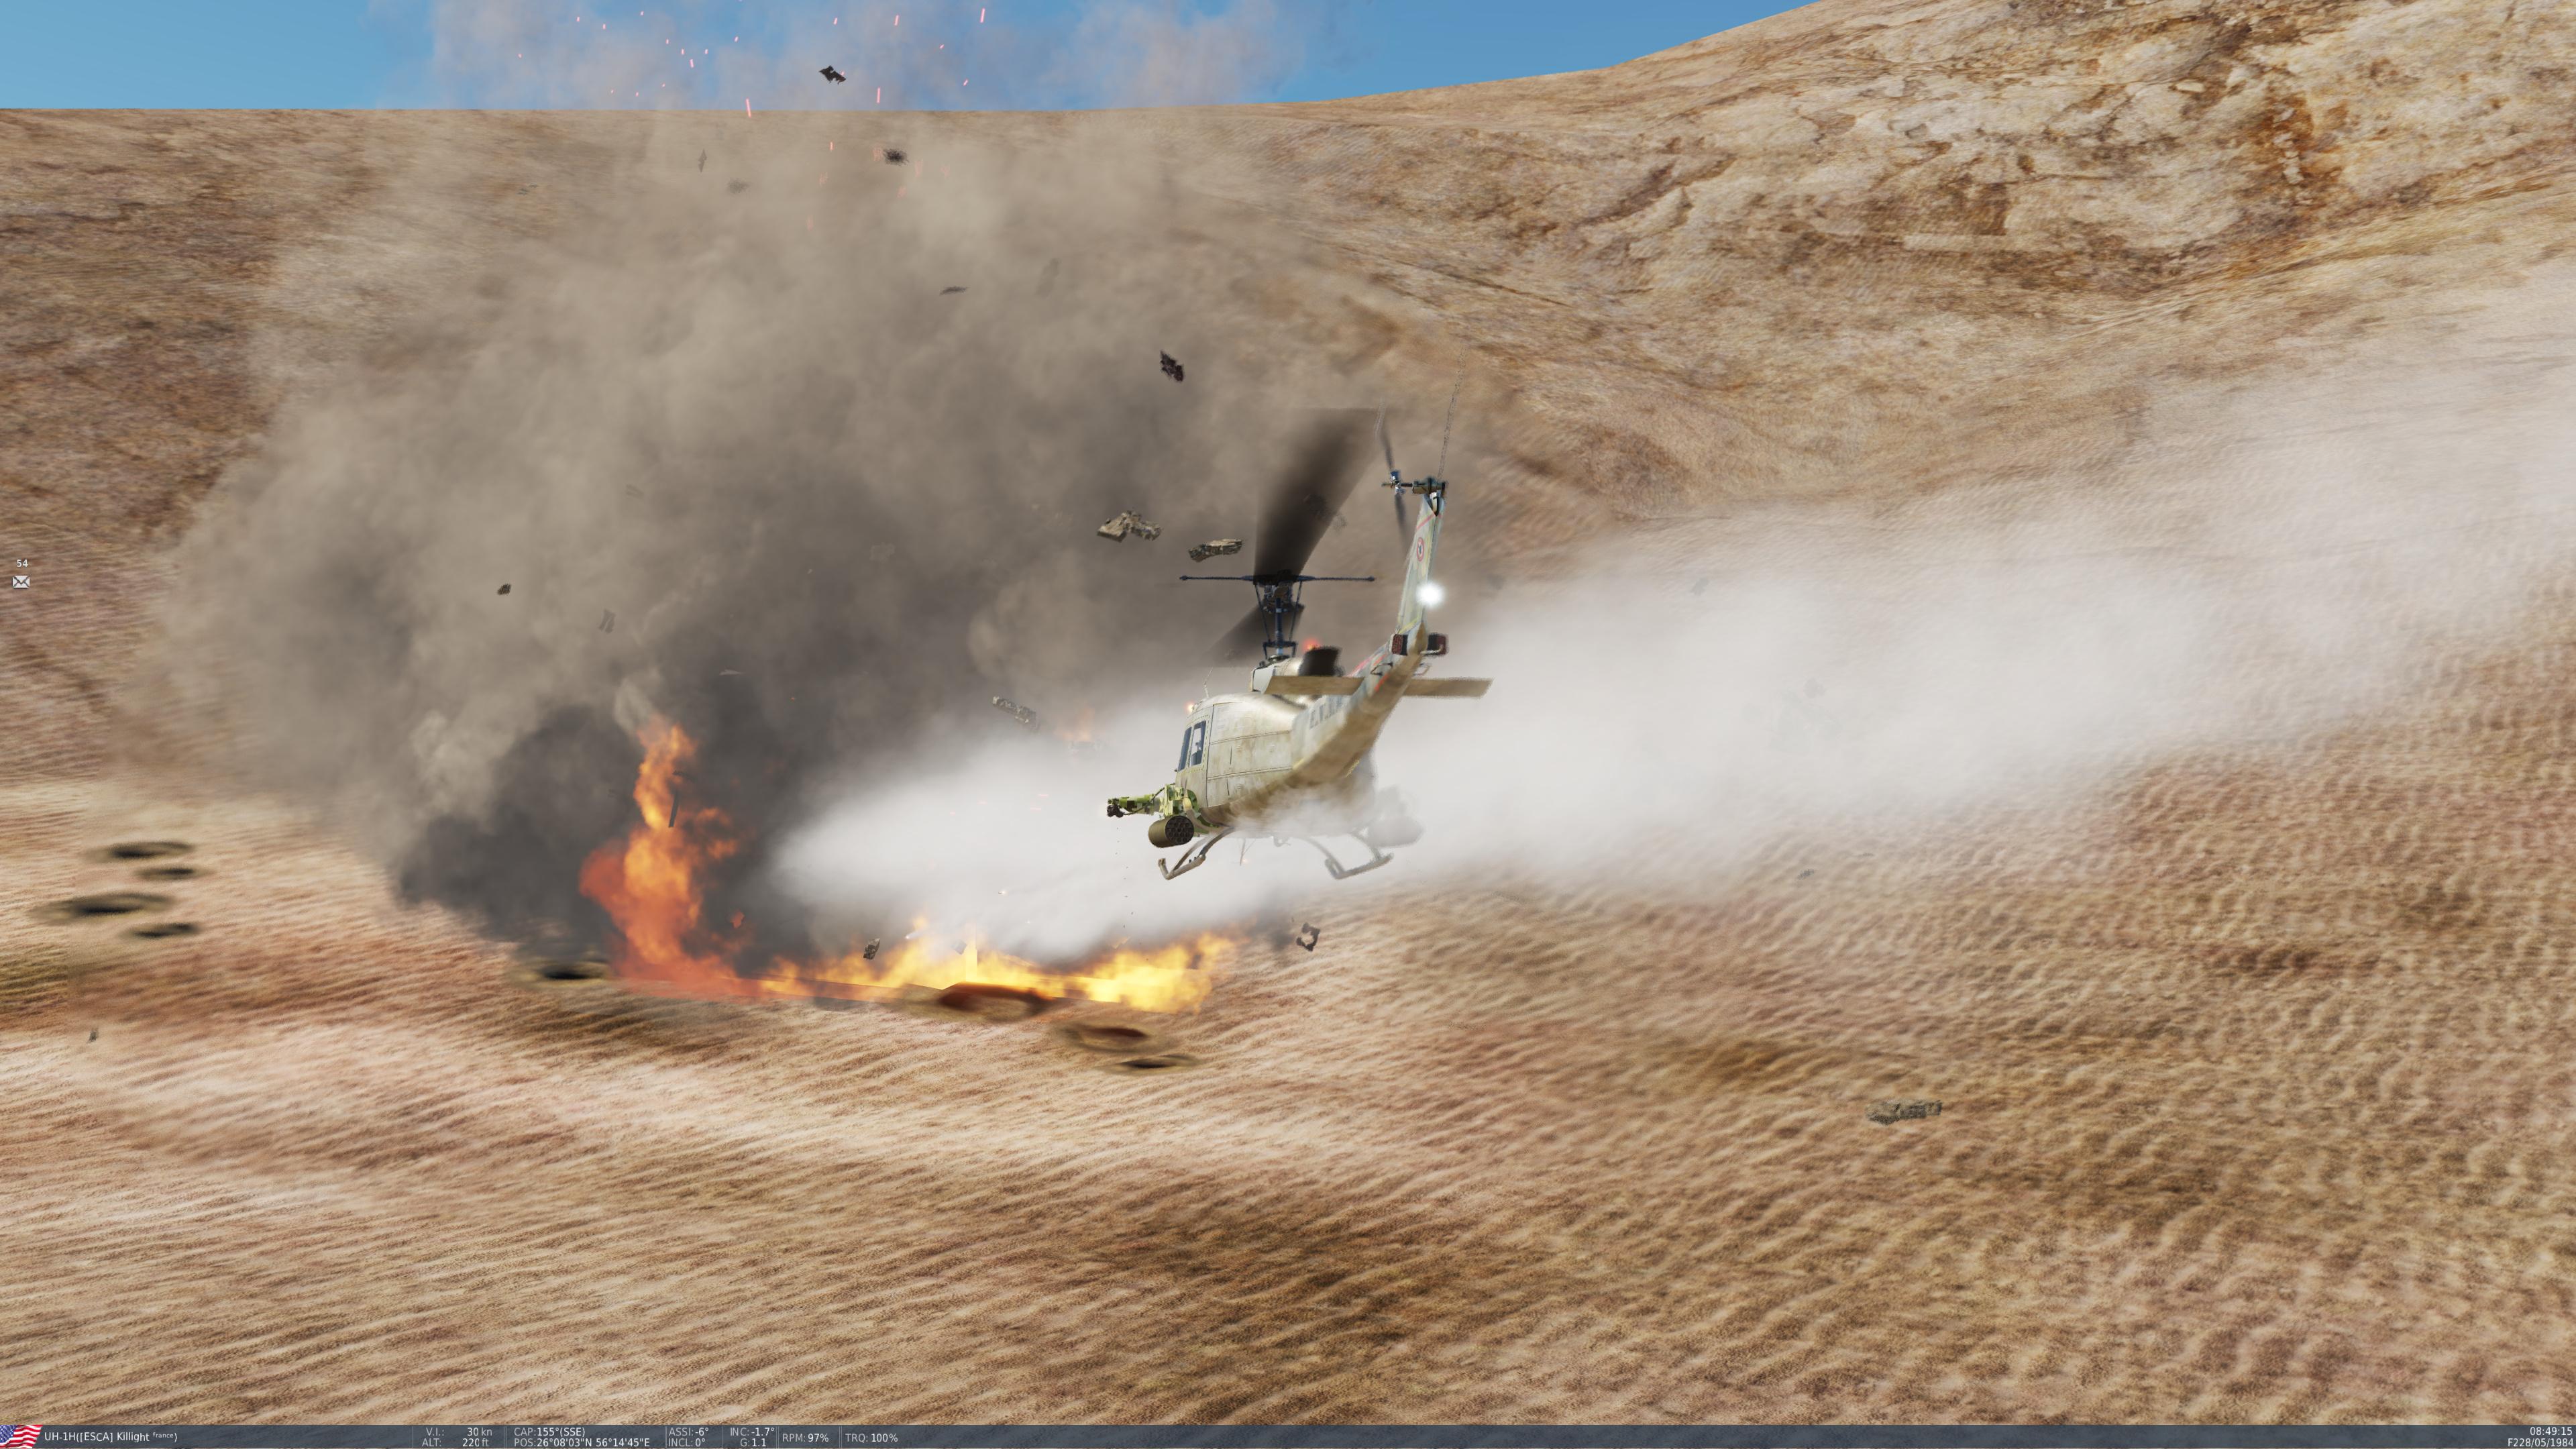 [Cursus UH-1H Huey] Photos de nos missions Bandicam_2021-01-26_22-56-06-578